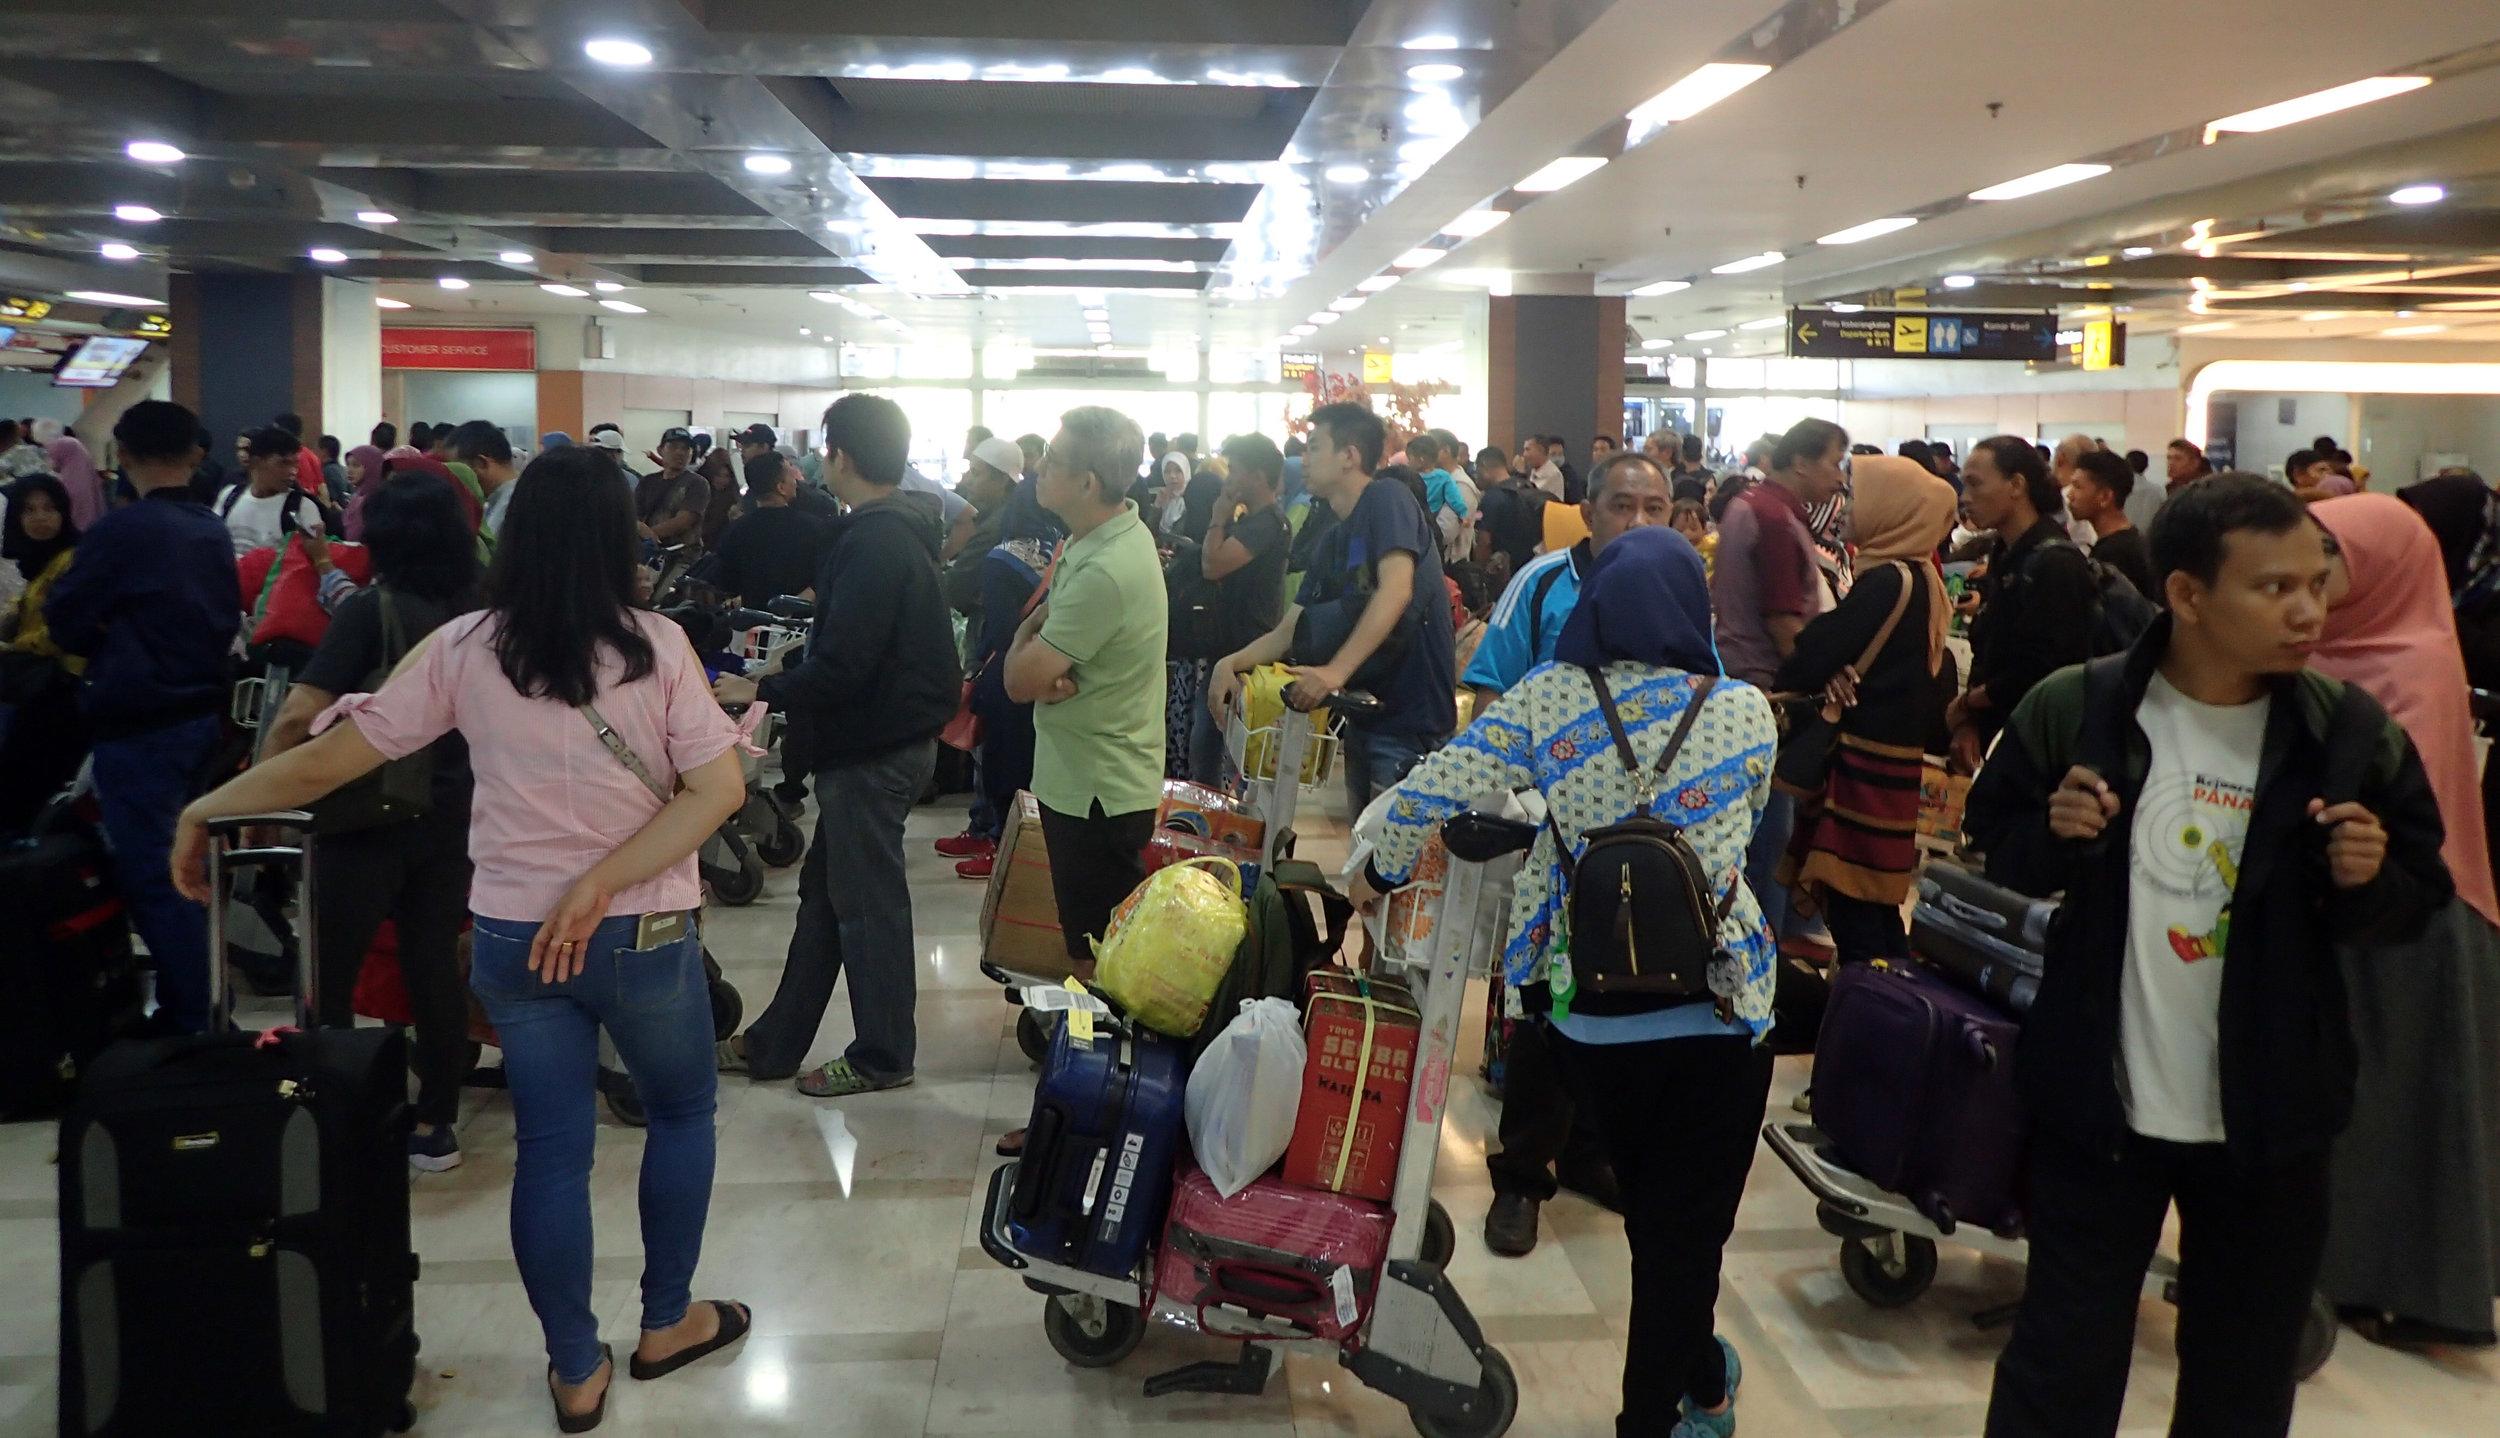 ridiculous crowds Makassar airport.jpg